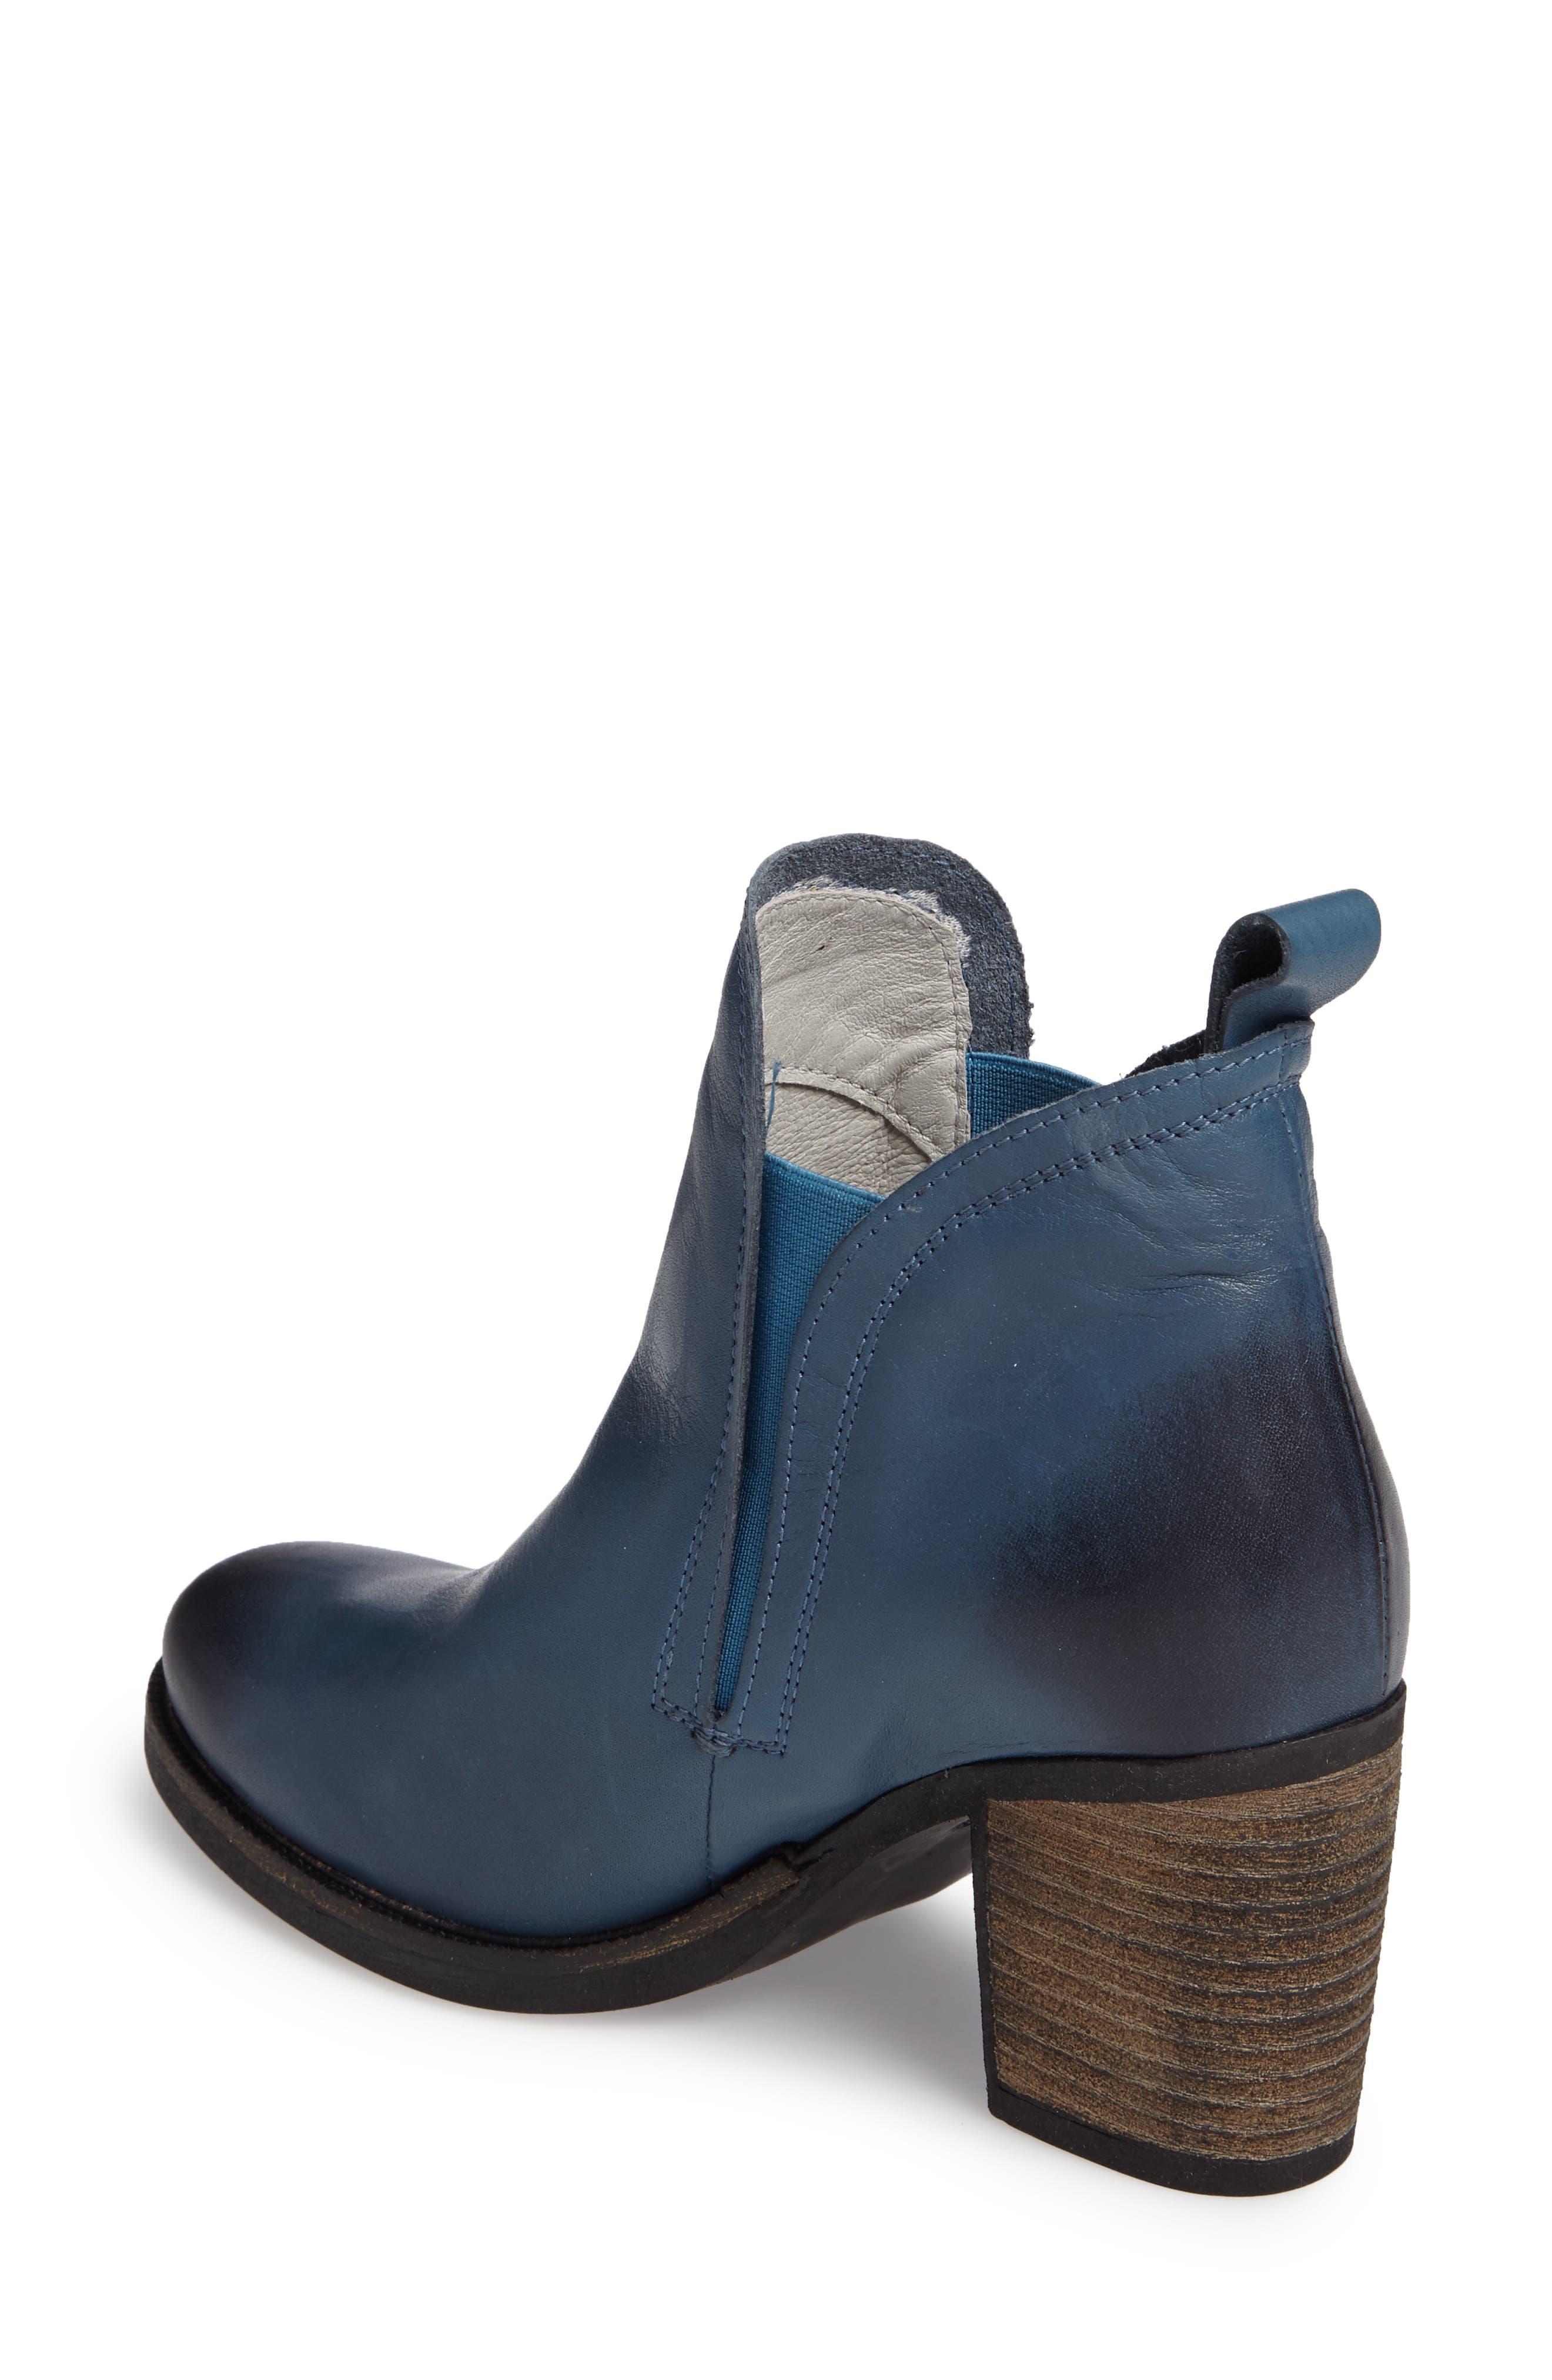 Belfielding Waterproof Chelsea Boot,                             Alternate thumbnail 2, color,                             Jeans/ Black Leather